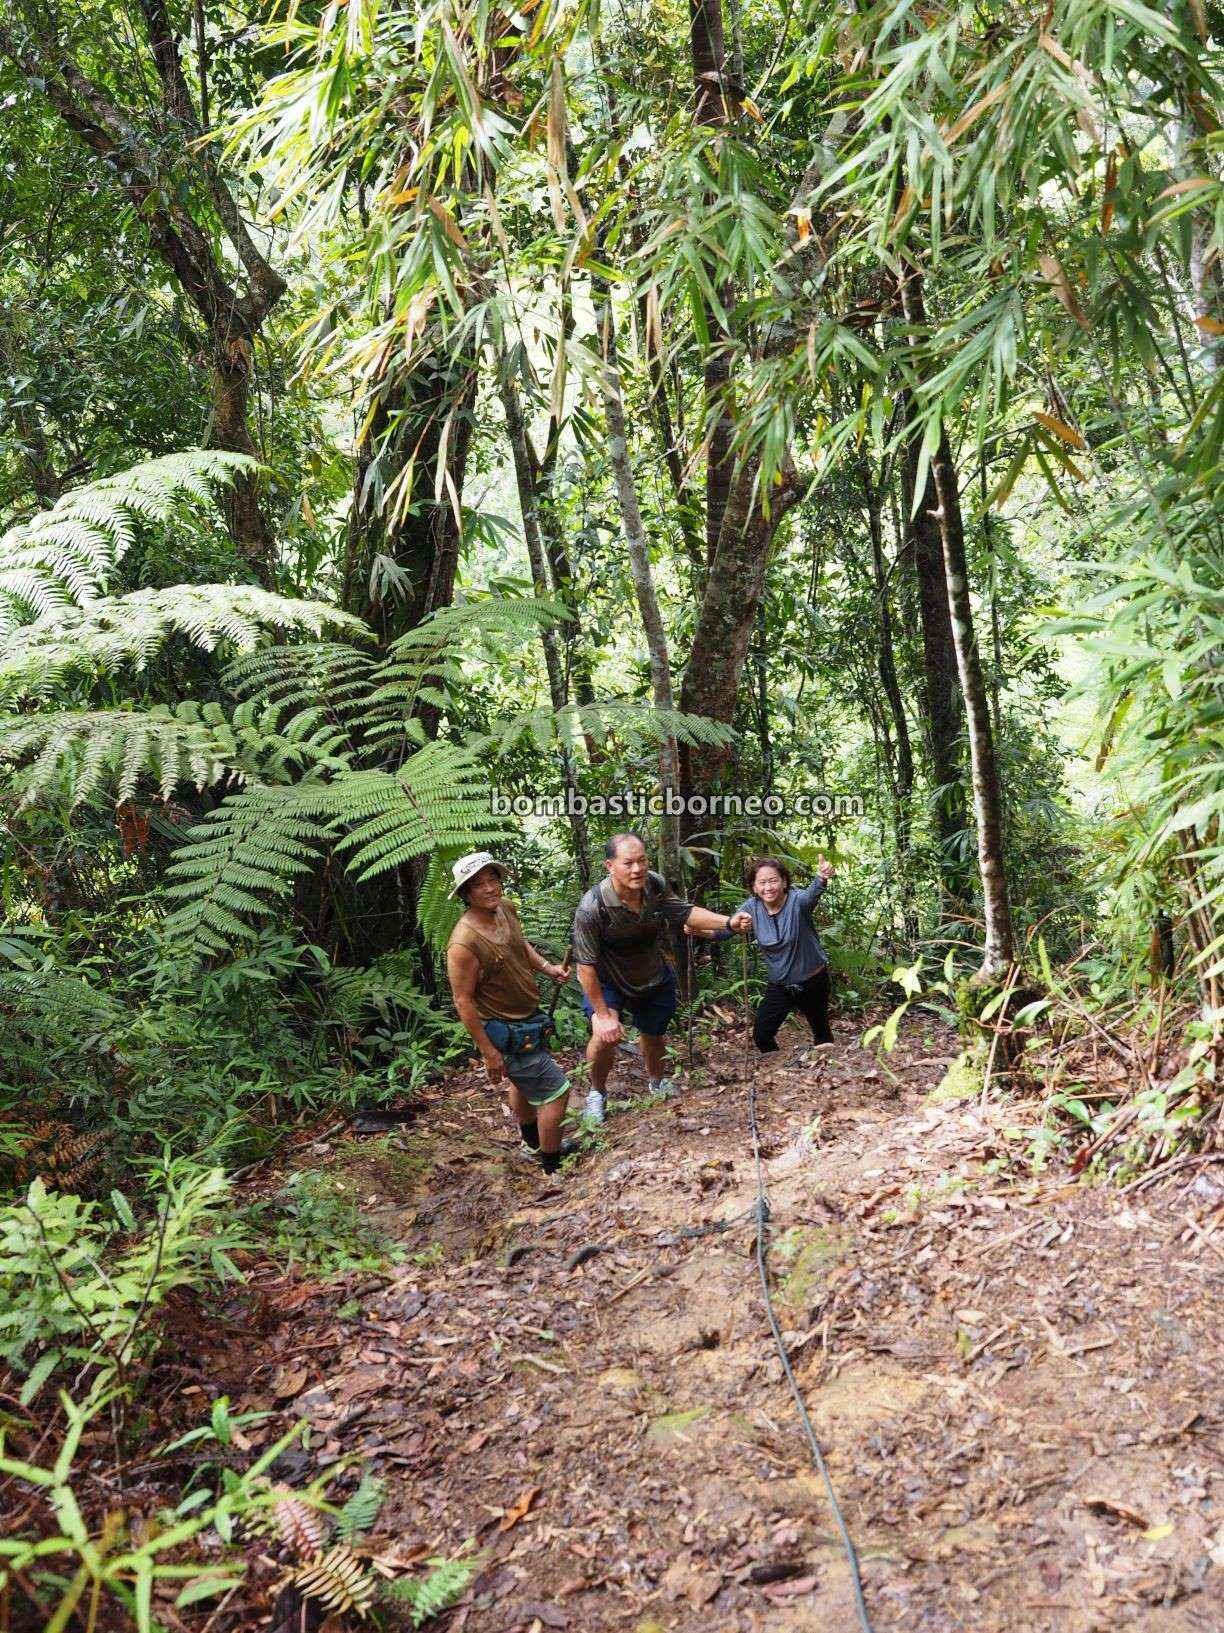 Bario, Kelabit Highlands, adventure, nature, outdoor, backpackers, destination, exploration, hiking, jungle trekking, Prayer mountain, Interior village, Malaysia, Sarawak, Borneo,